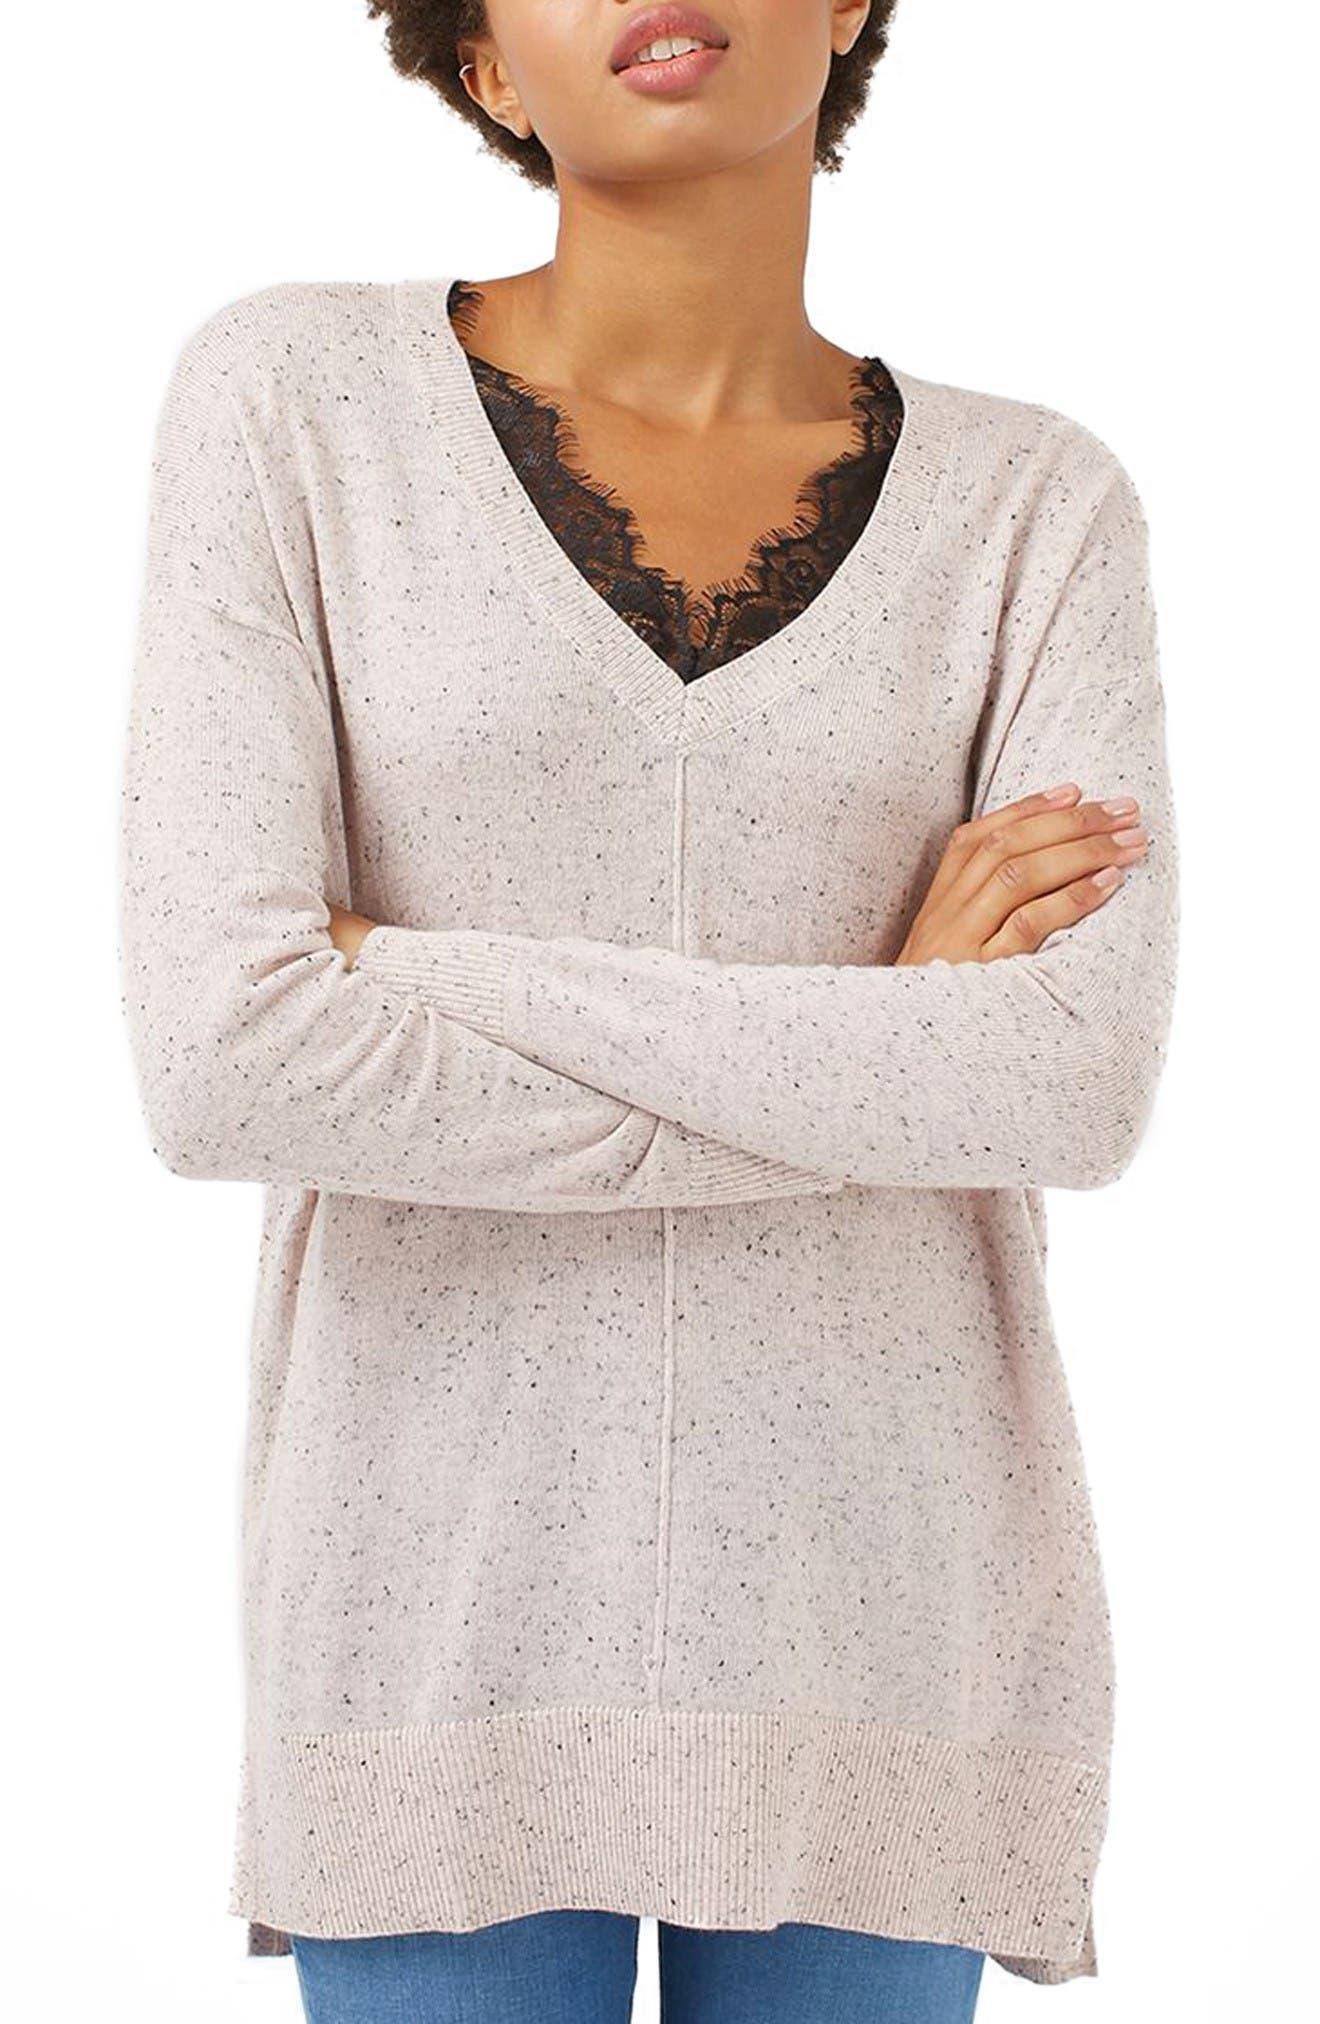 Main Image - Topshop Lace V-Neck Sweater Tunic